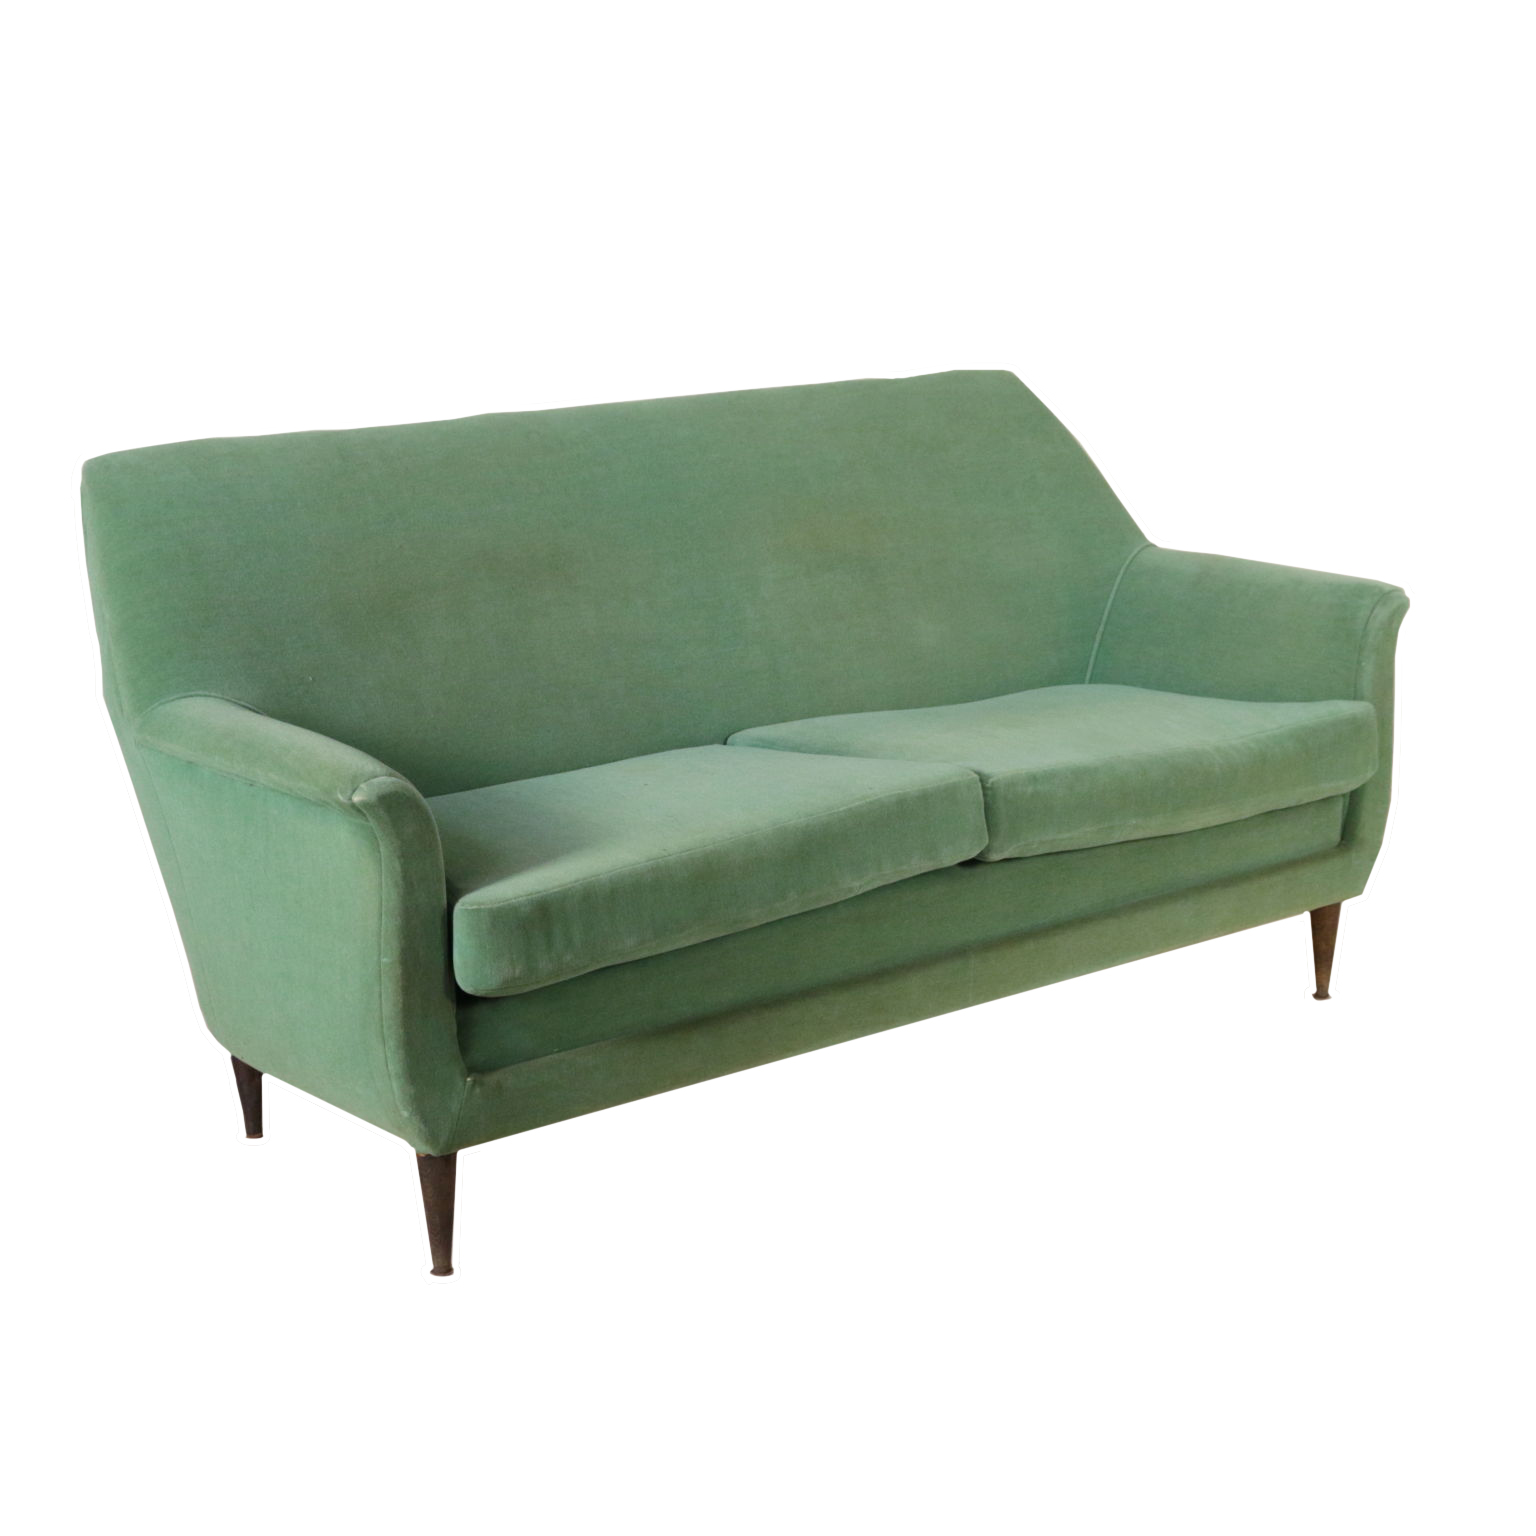 Divano anni 50 60 divani modernariato - Divano profondo 60 cm ...